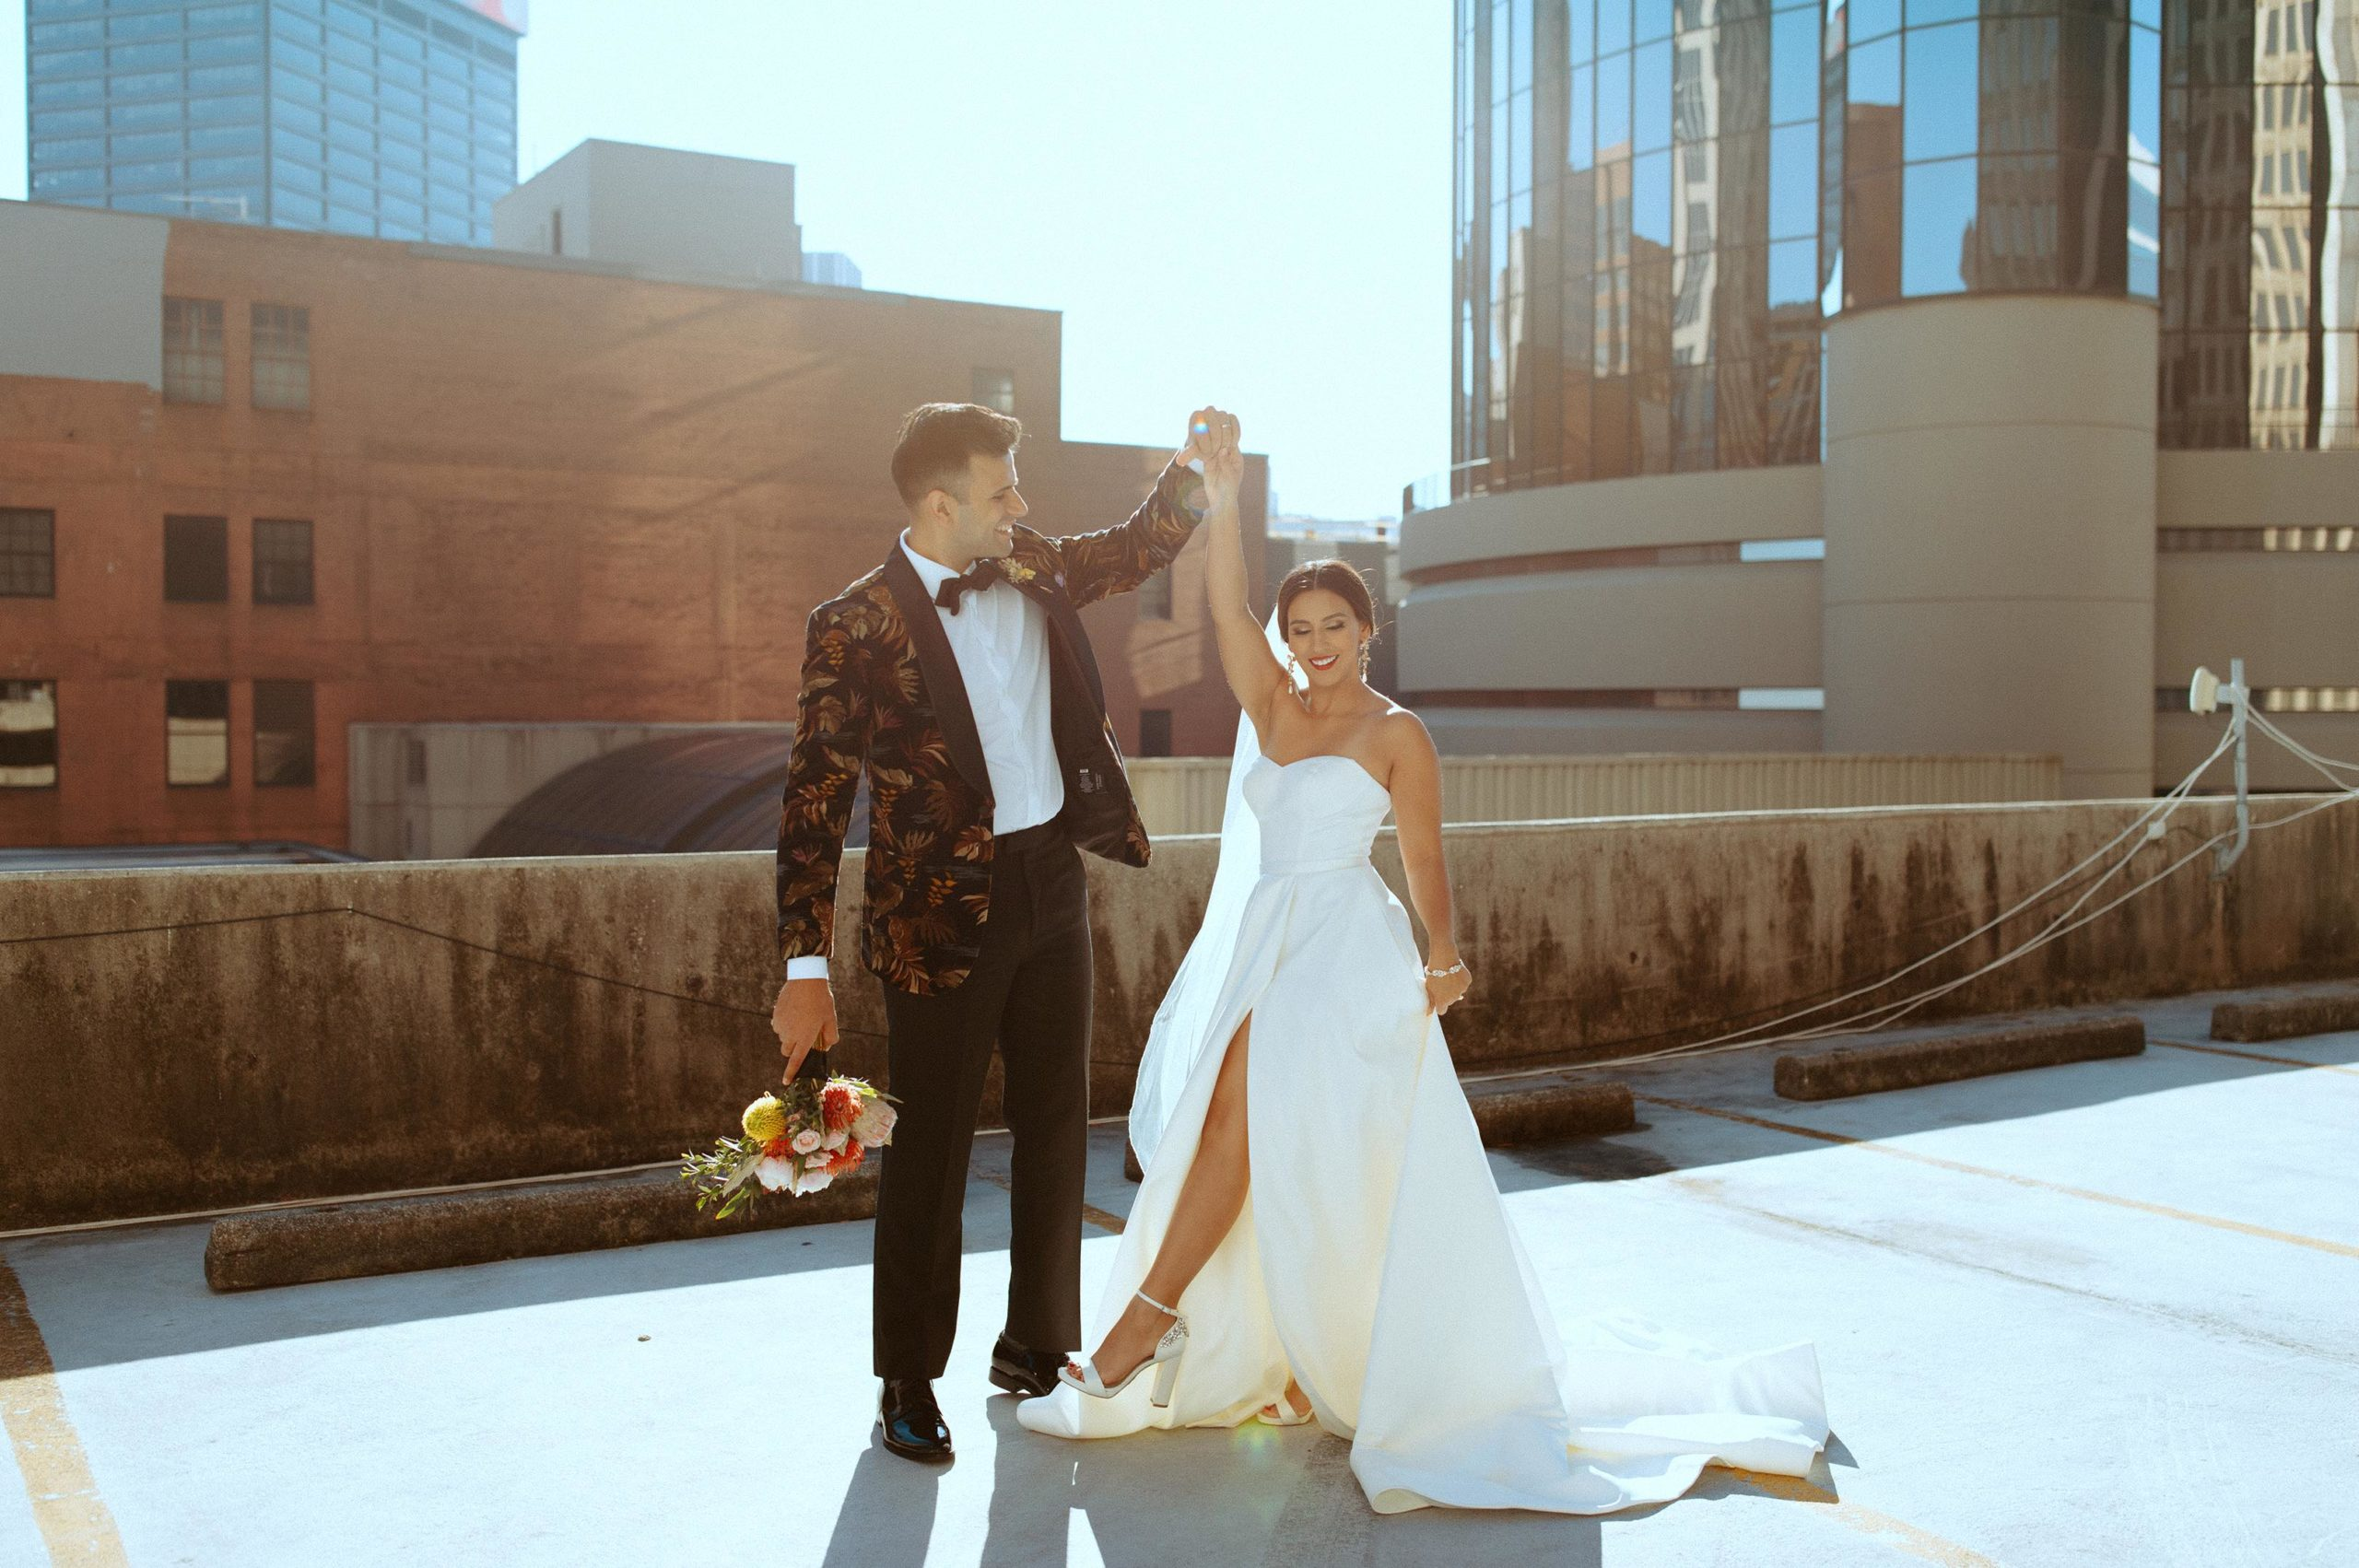 Sabrina in Style WG4017 with husband on Atlanta Rooftop